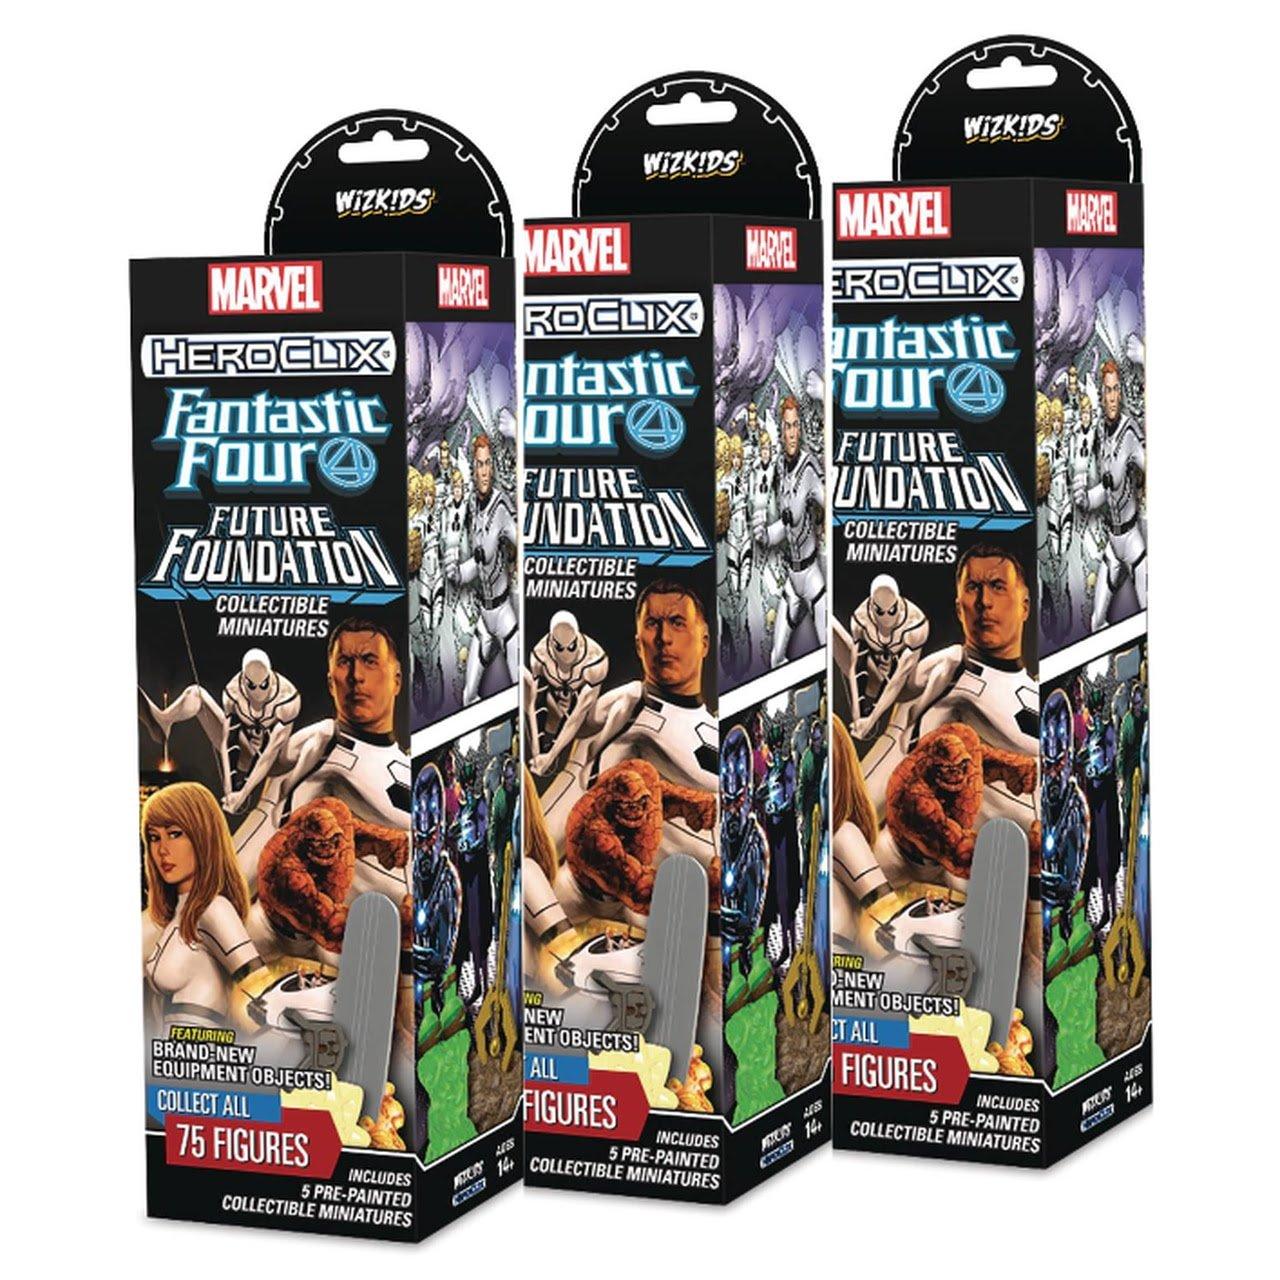 Marvel Heroclix Fantastic Four Future Foundation Game